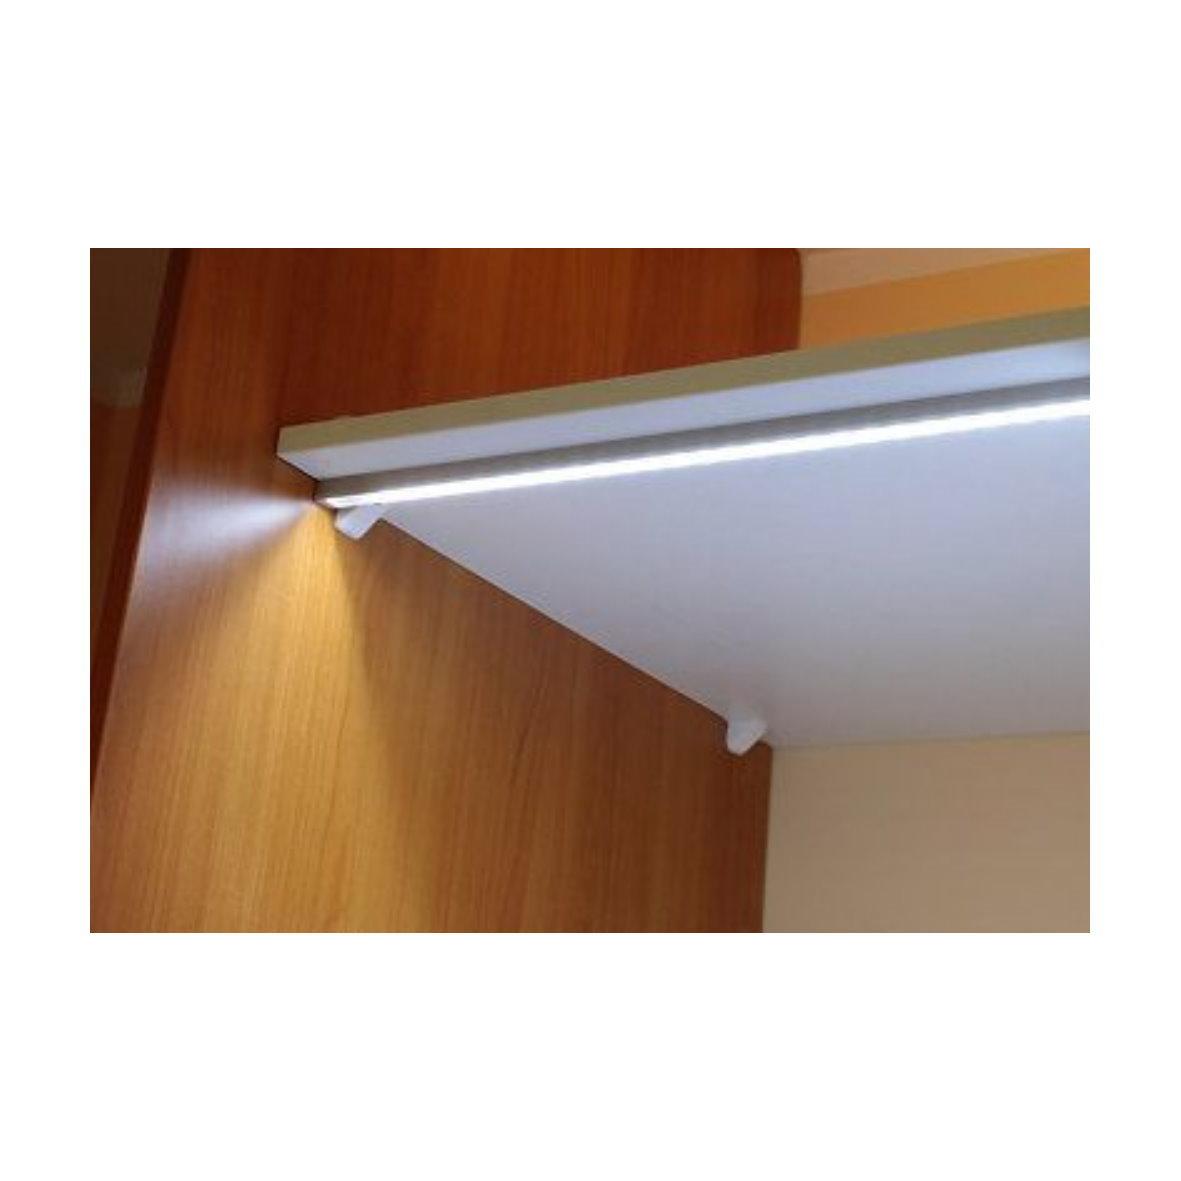 7 45 m einbau profil leiste pvc flexibel biegsam 2m opal f r led stripe ebay. Black Bedroom Furniture Sets. Home Design Ideas